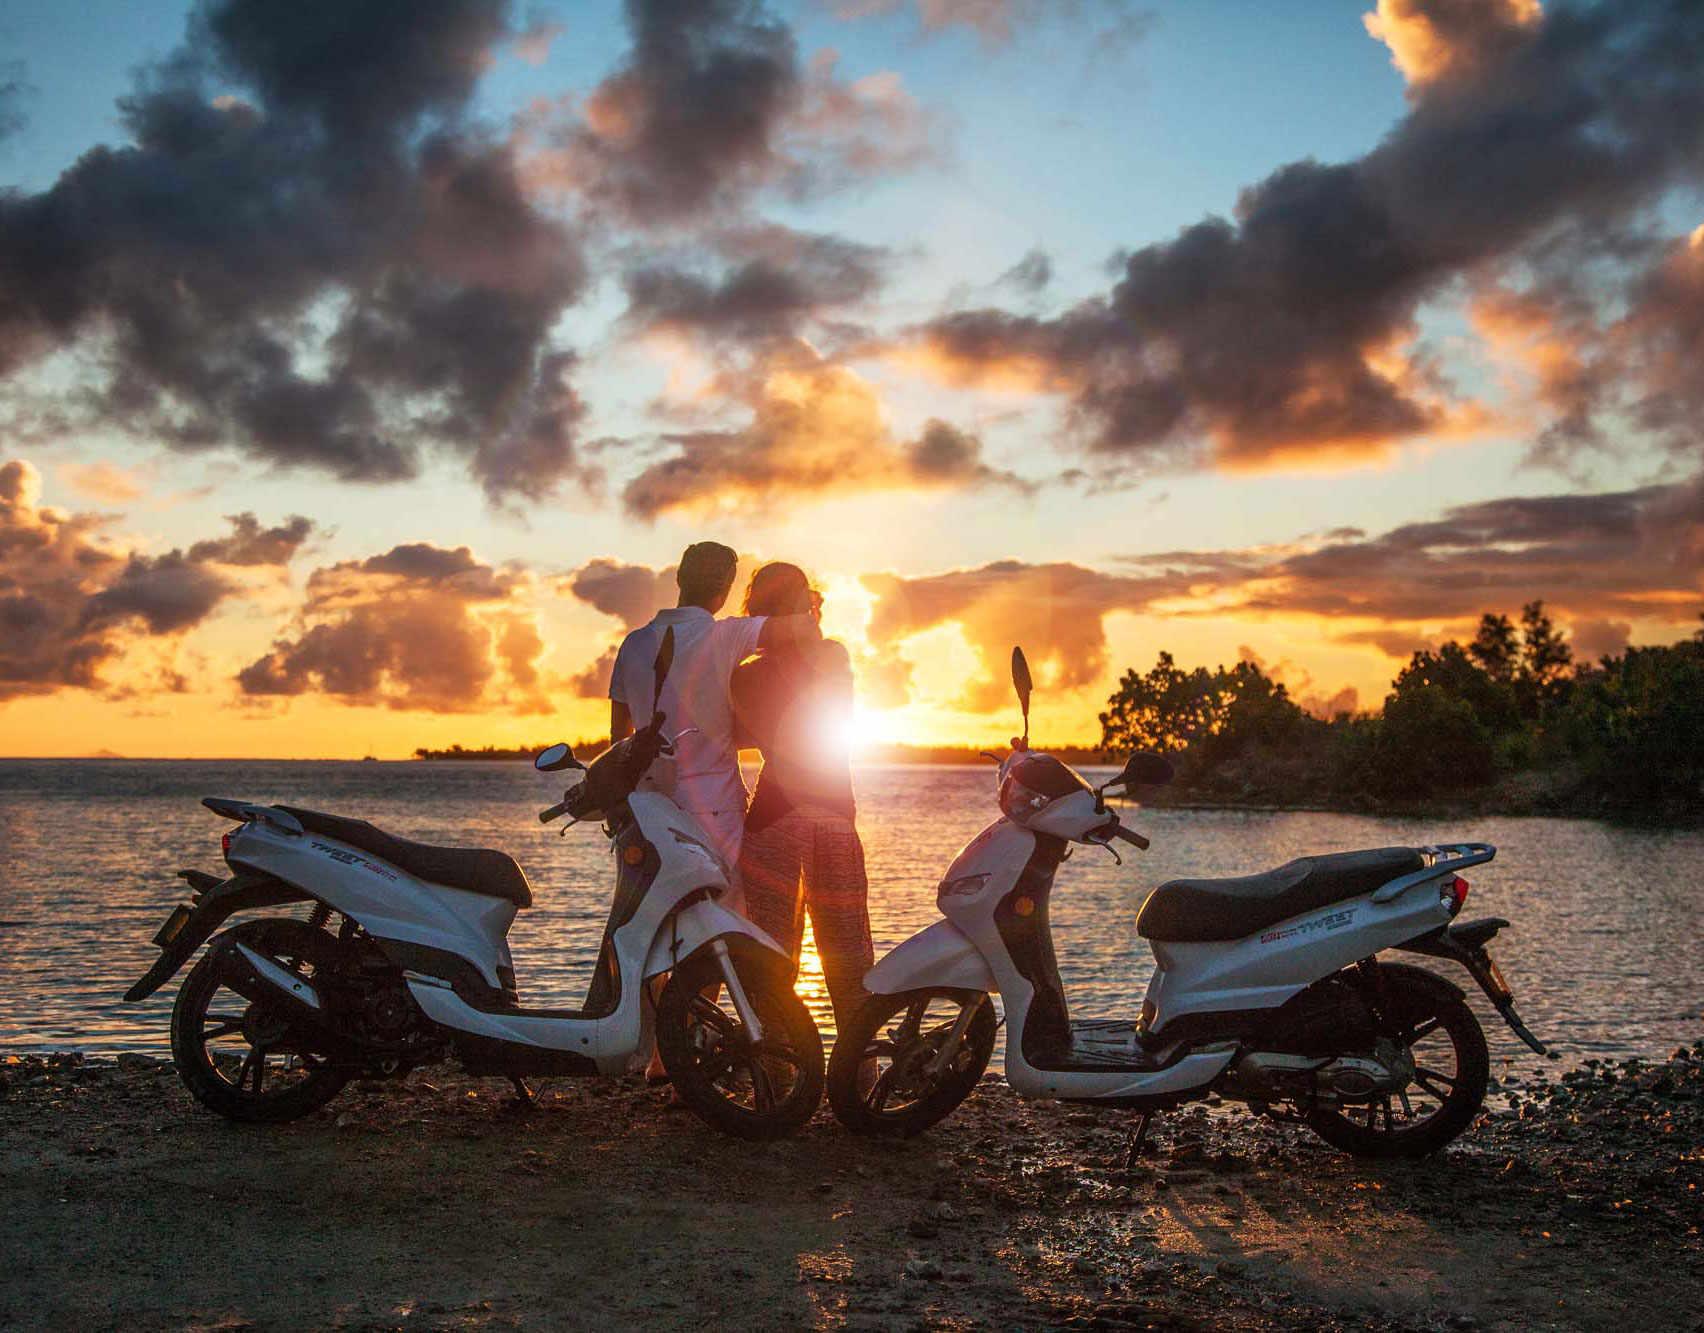 Avis Bora Bora Car Electric Fun Car Moped And Bike